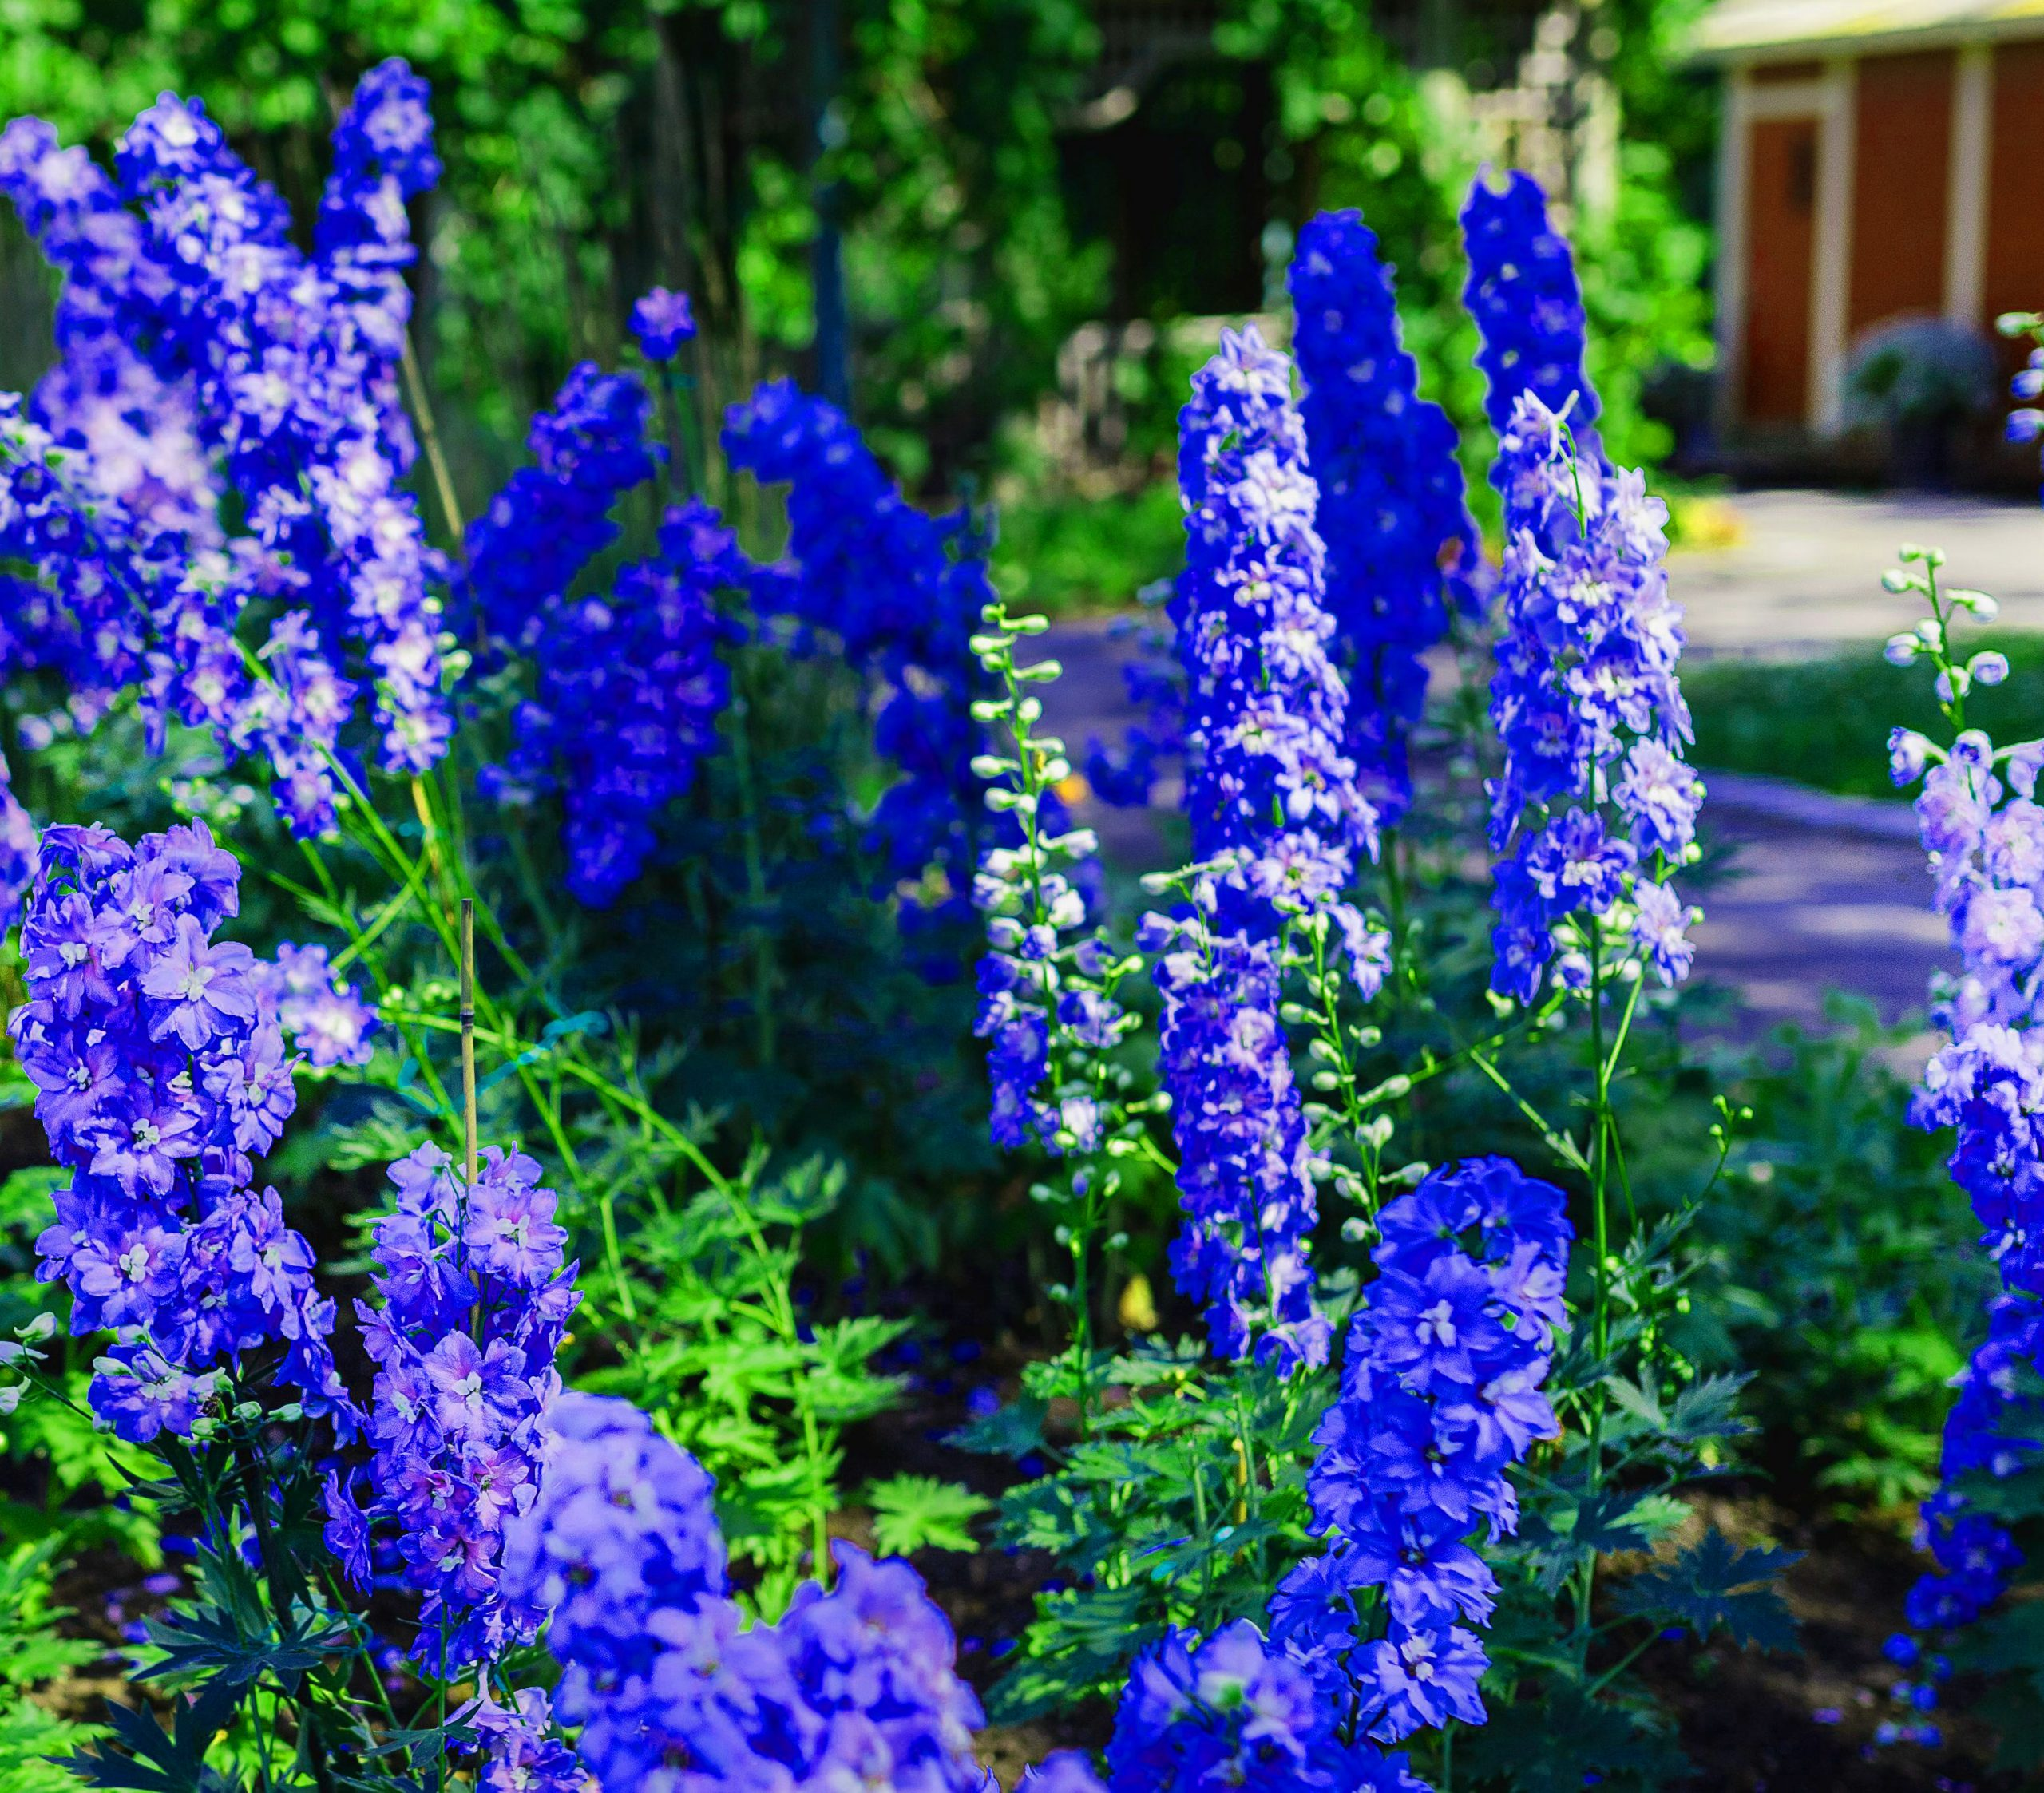 1080p Flower DP Pics